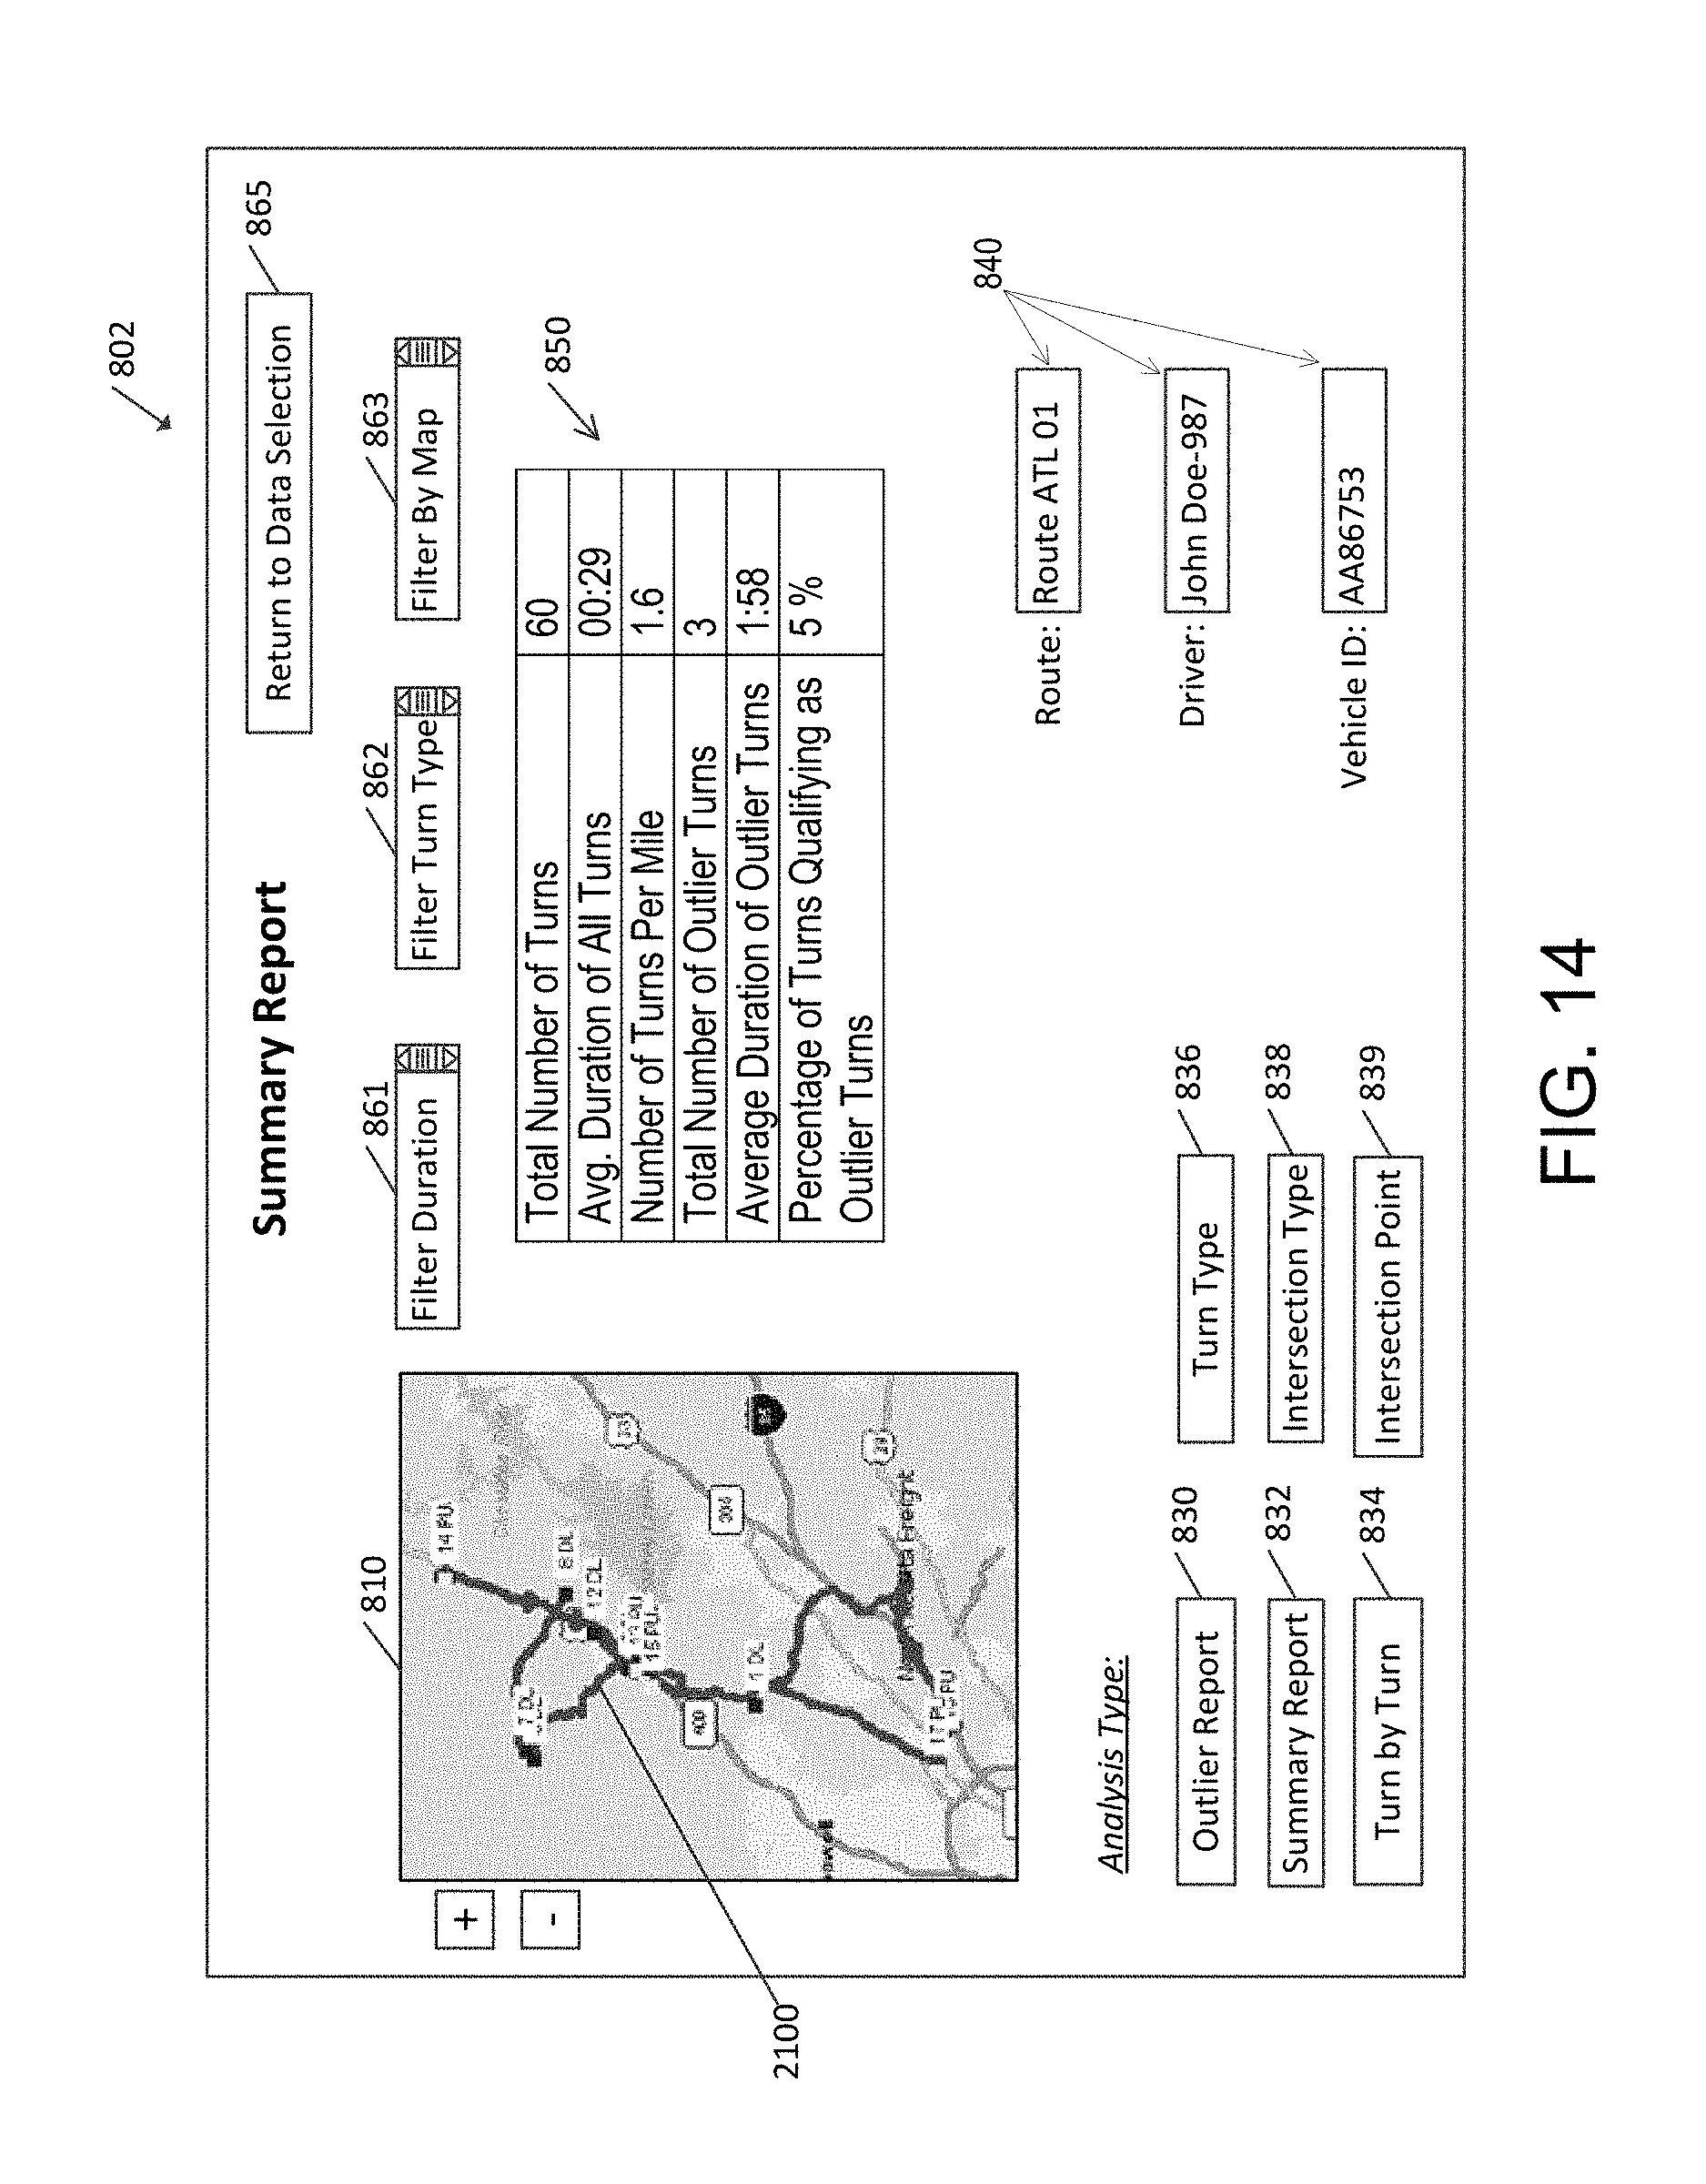 Patent US 9,805,521 B1